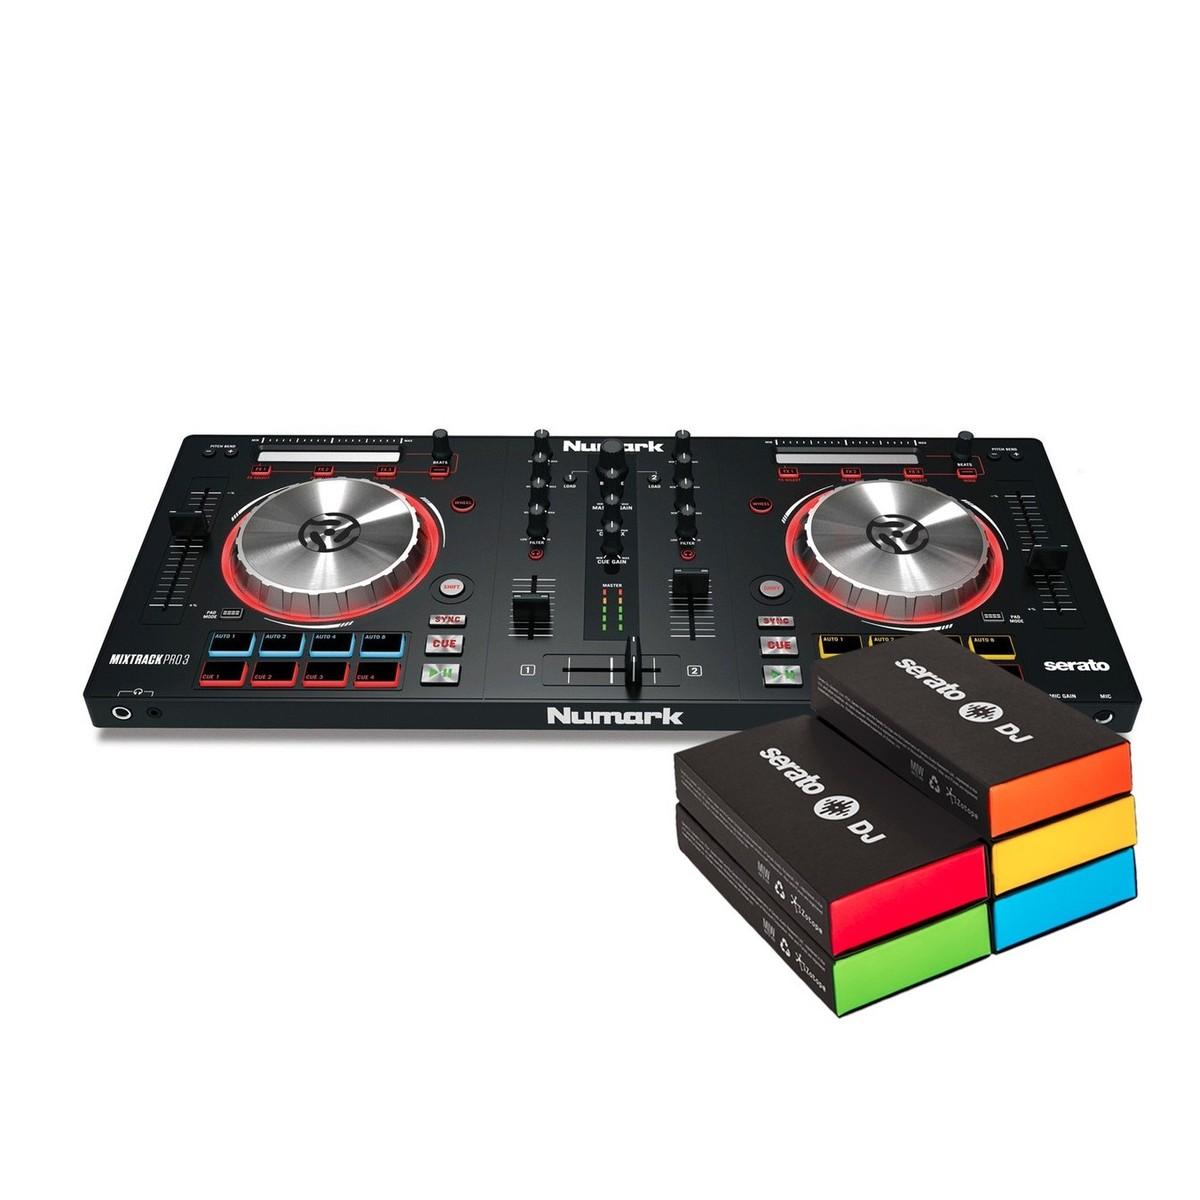 Numark Mixtrack Pro 3 with Upgrade to Serato DJ